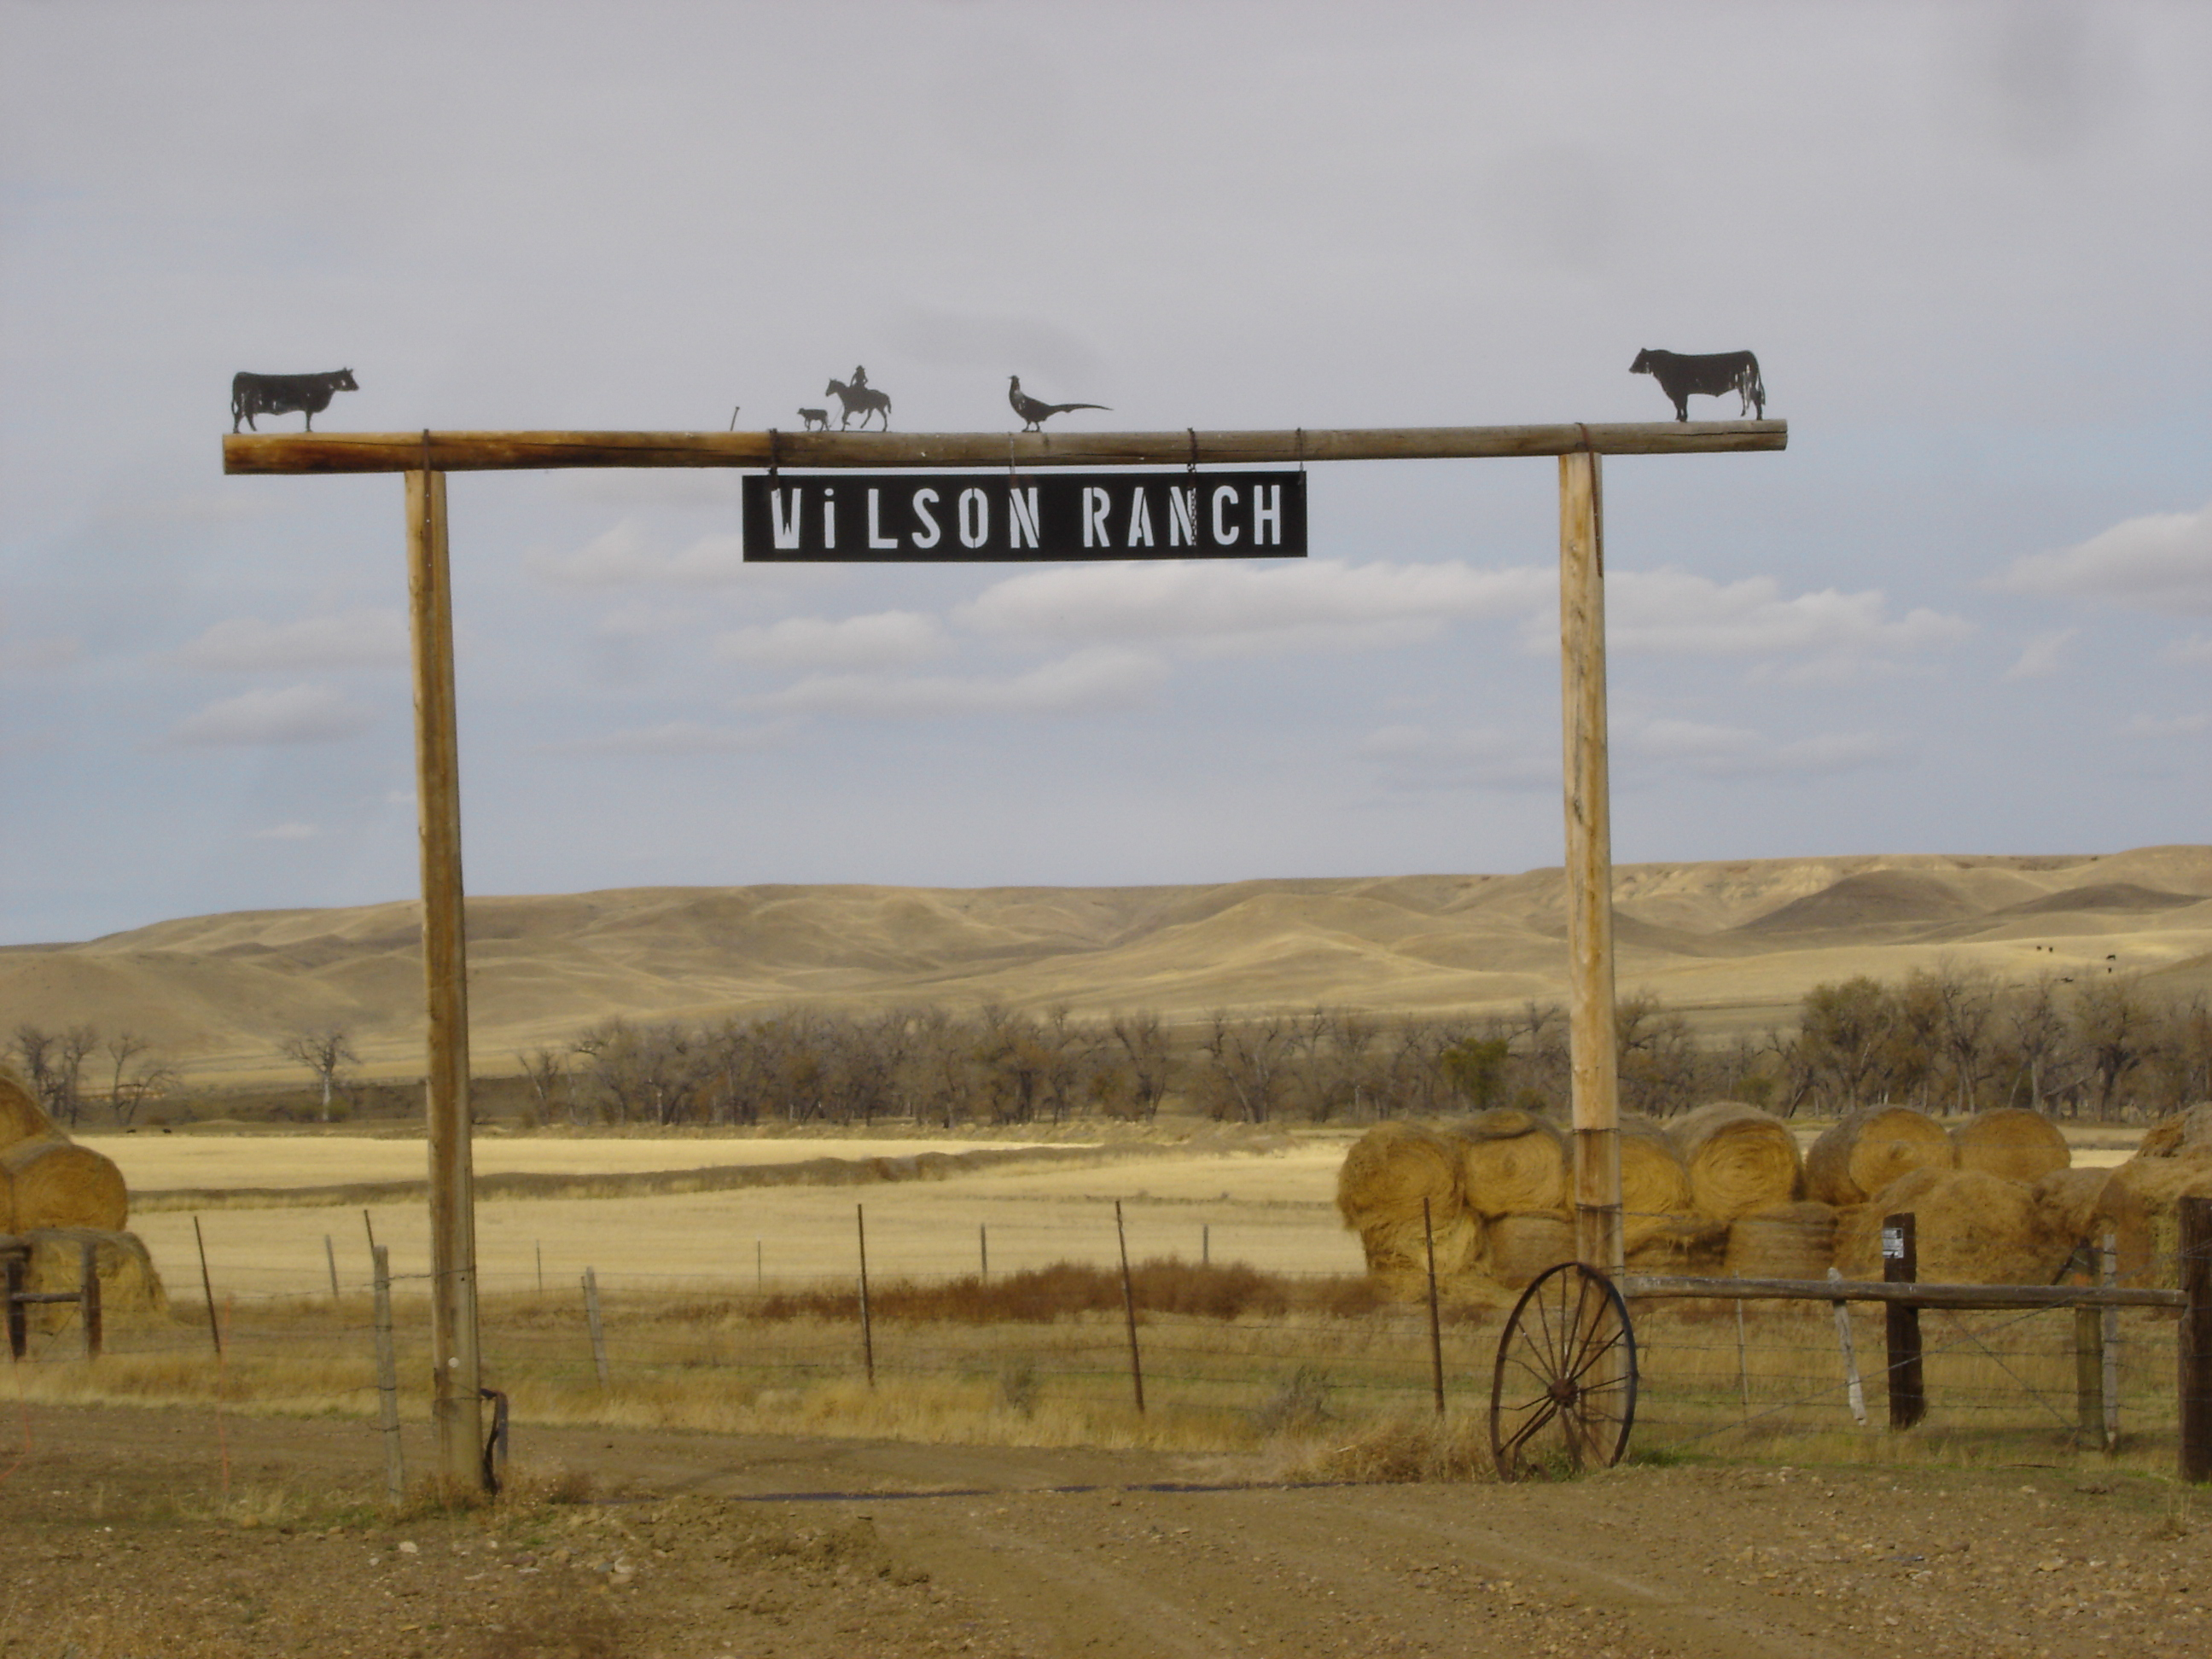 Wilson Ranch Entrance